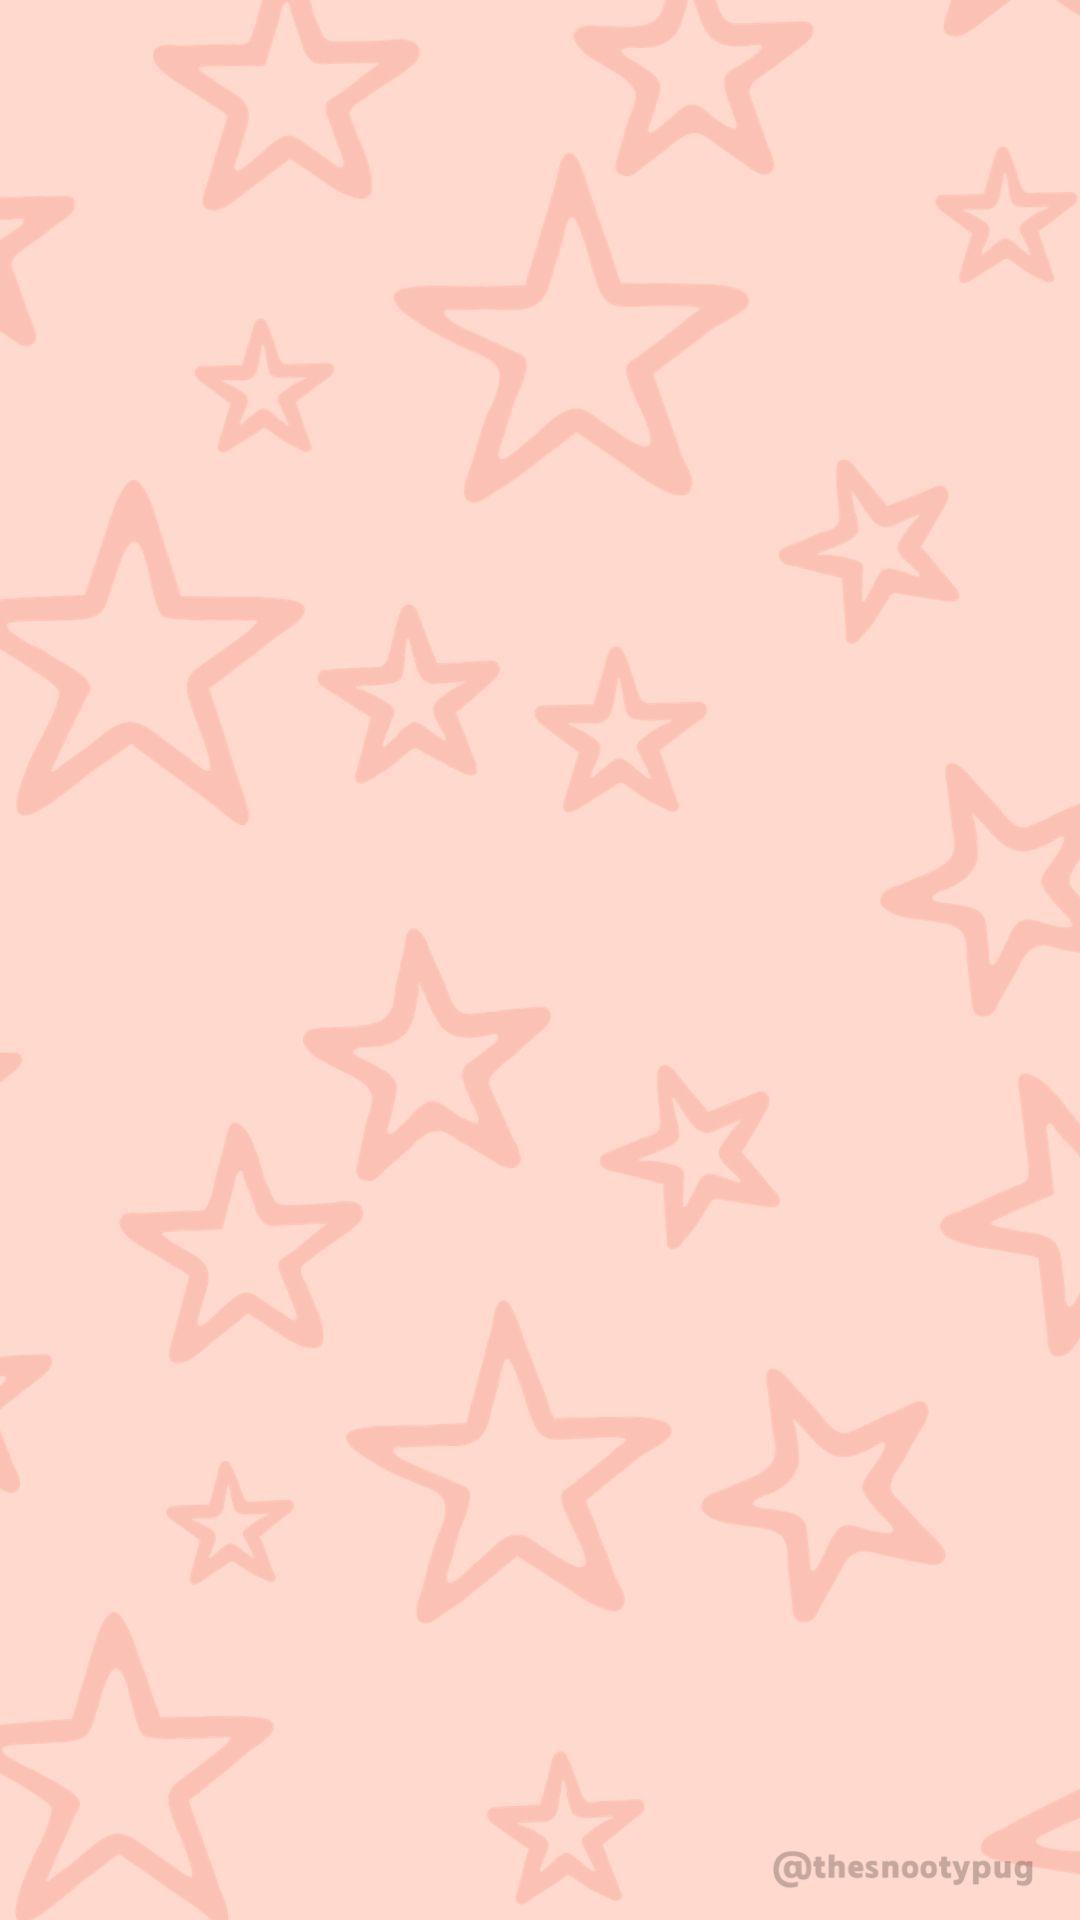 Pink Star Wallpaper Star Wallpaper Iphone Background Wallpaper Artsy Background